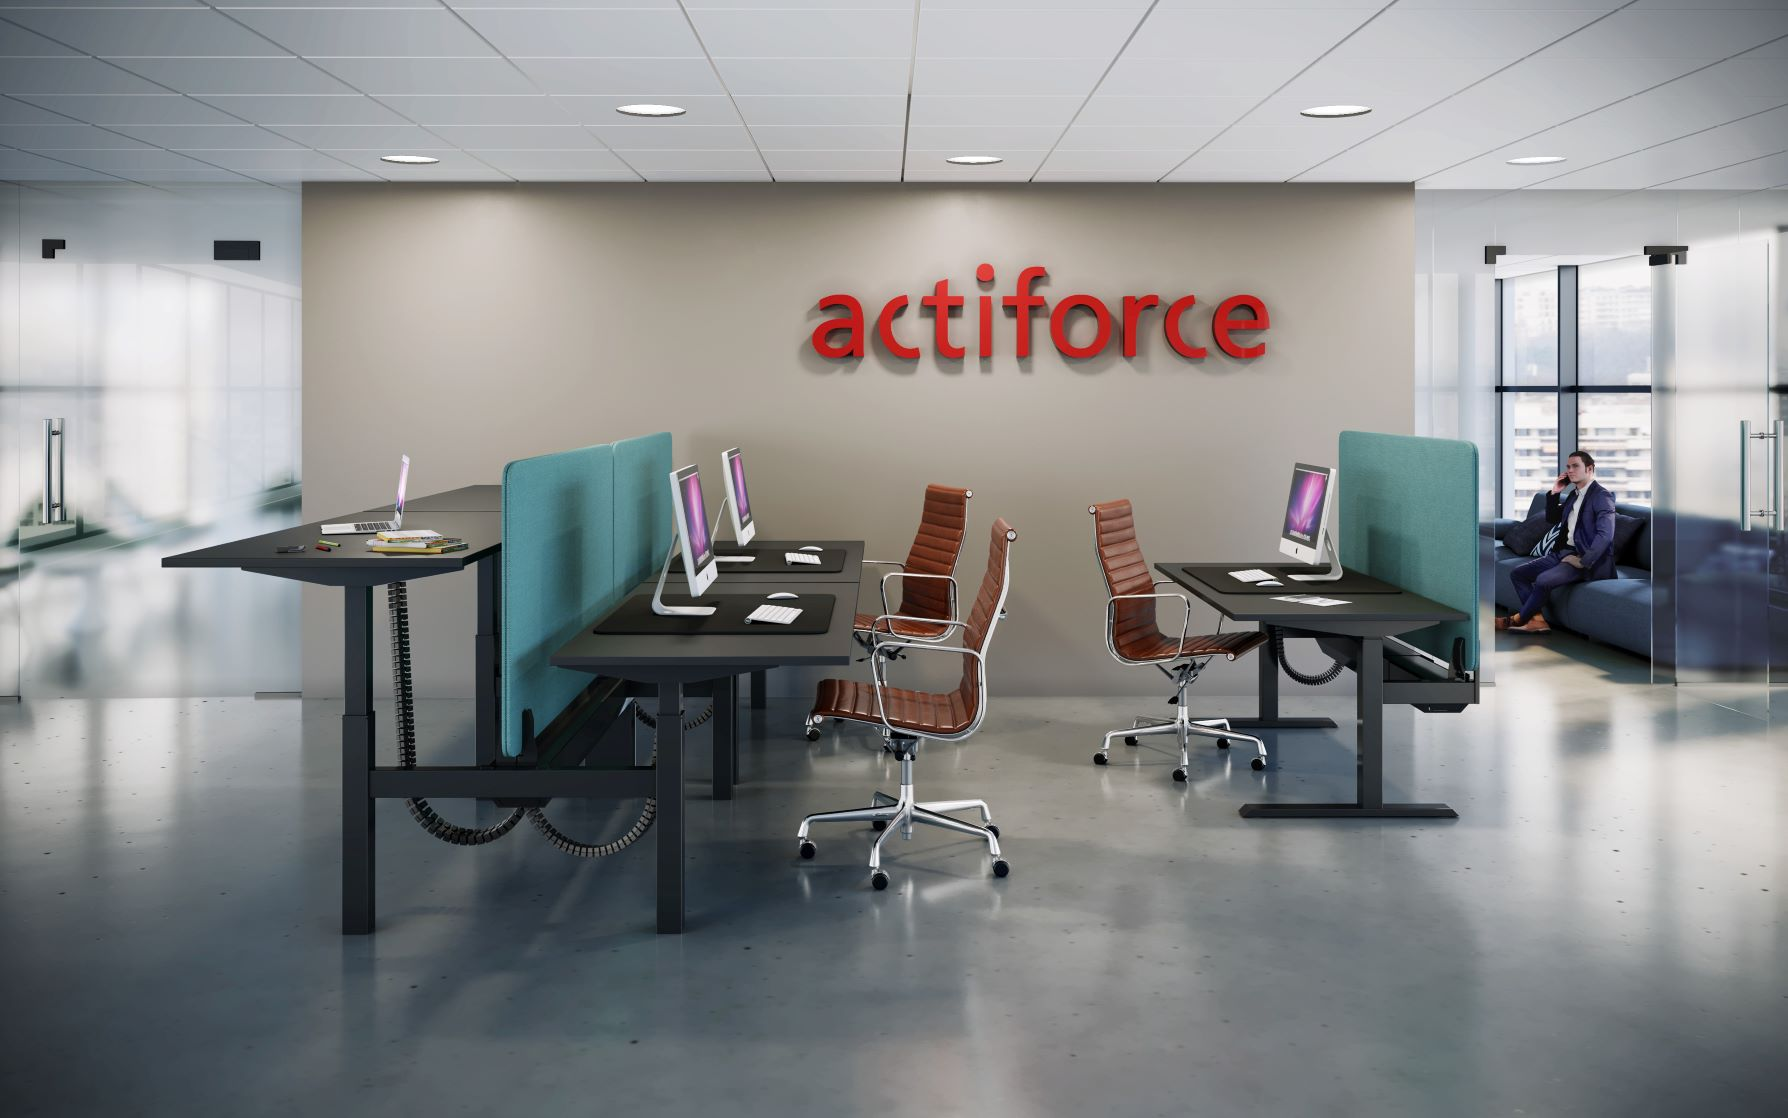 Image: Actiforce